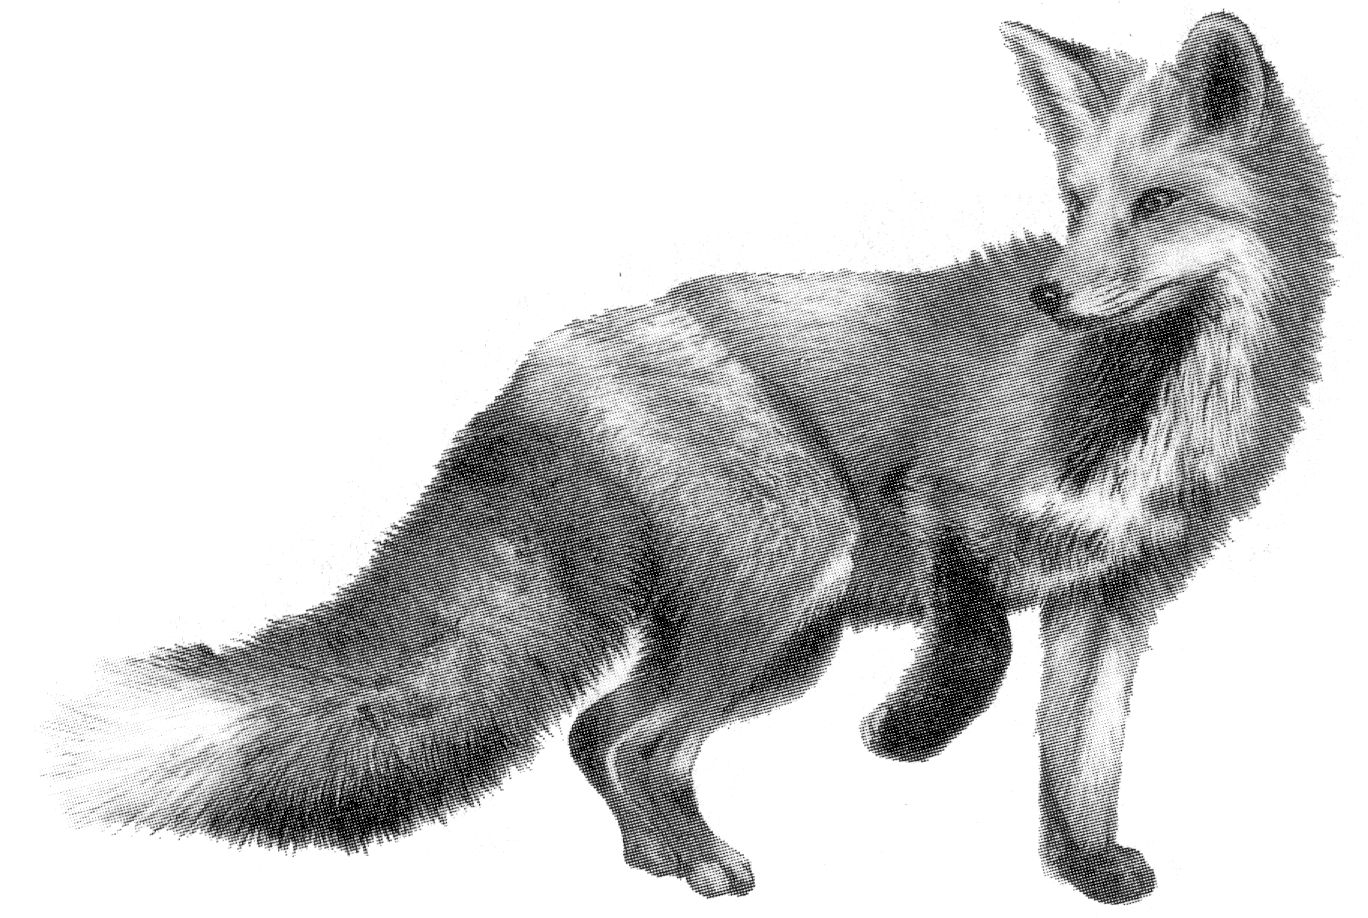 Last of the Foxes: lastofthefoxes.tumblr.com